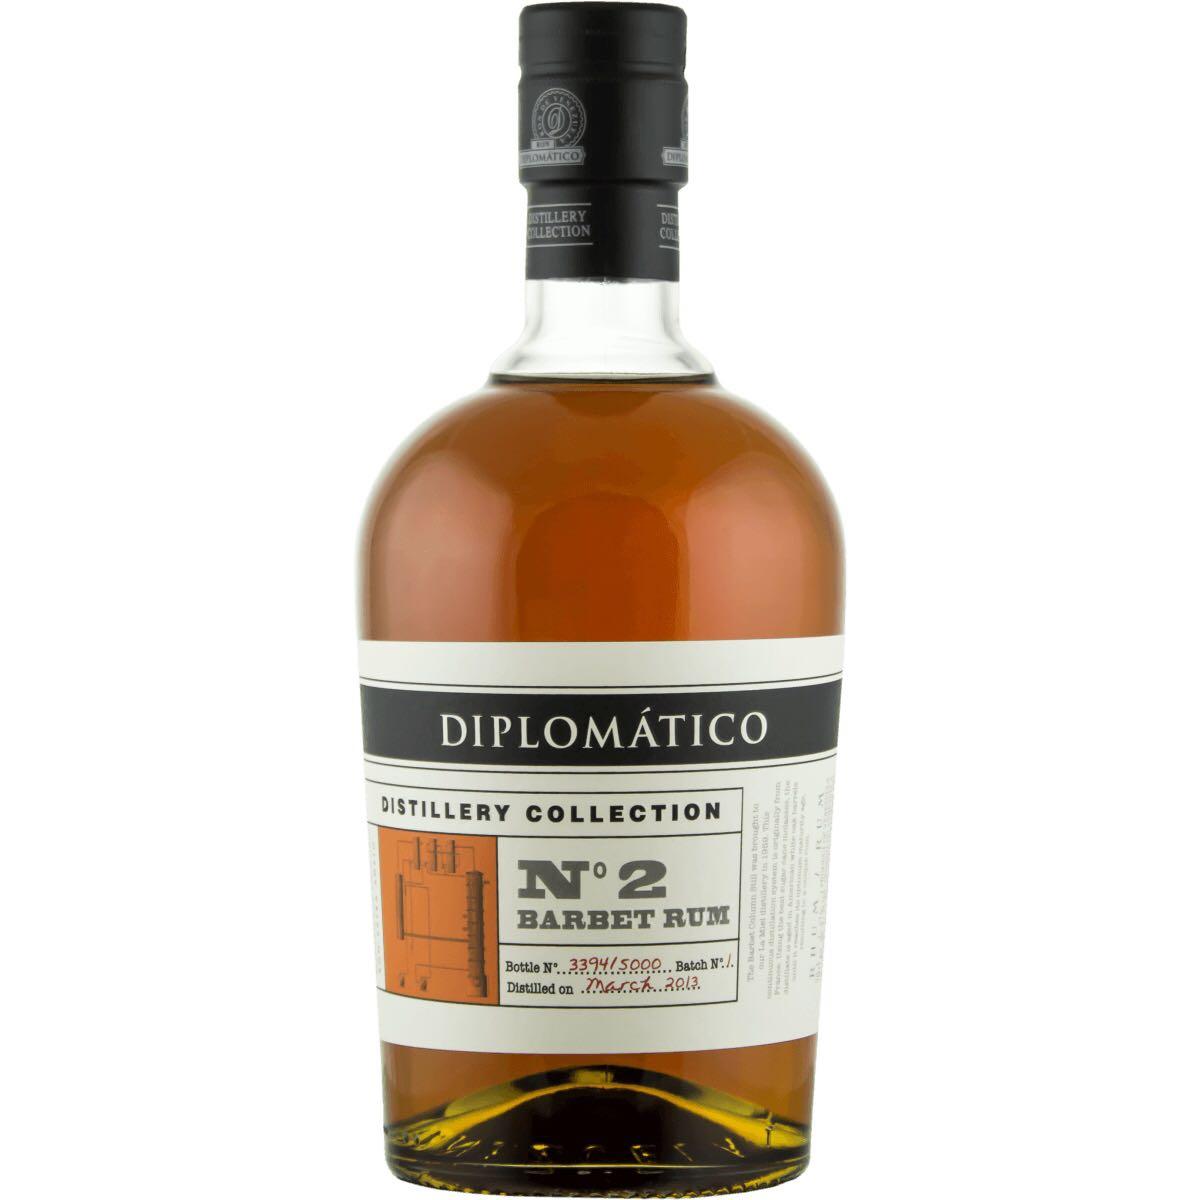 Bottle image of Diplomático / Botucal No. 2 Single Barbet Column Rum